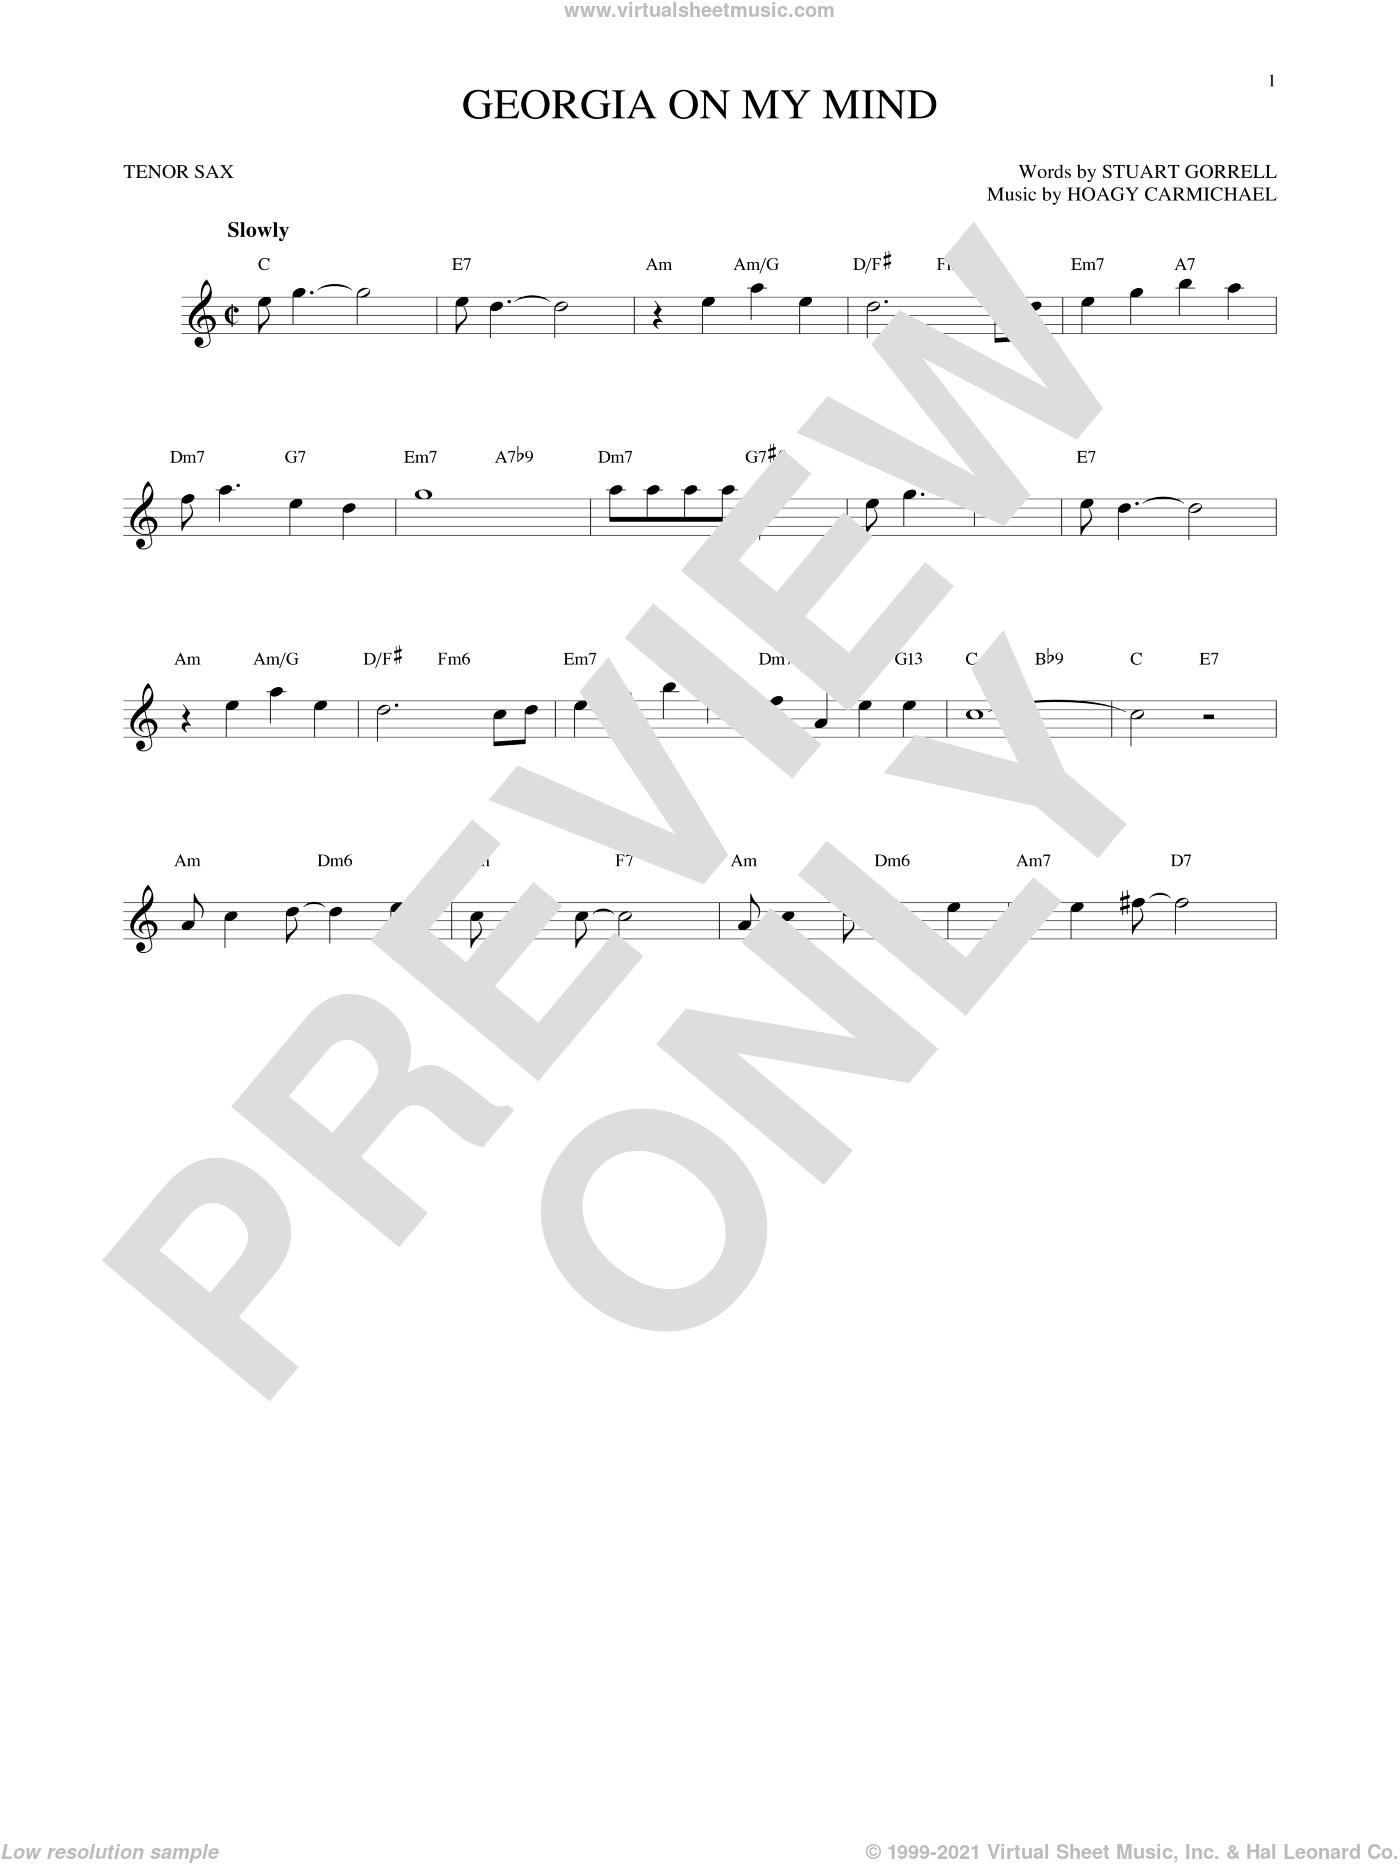 Carmichael - Georgia On My Mind sheet music for tenor saxophone solo